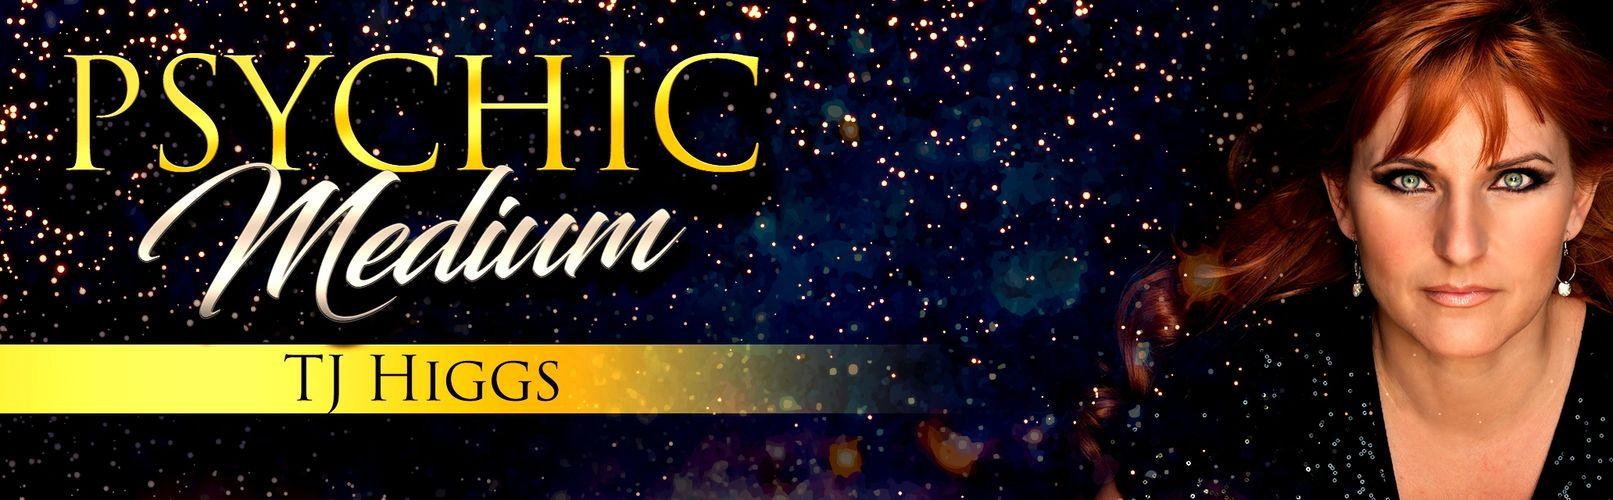 Psychic Medium TJ Higgs - Psychic, Medium